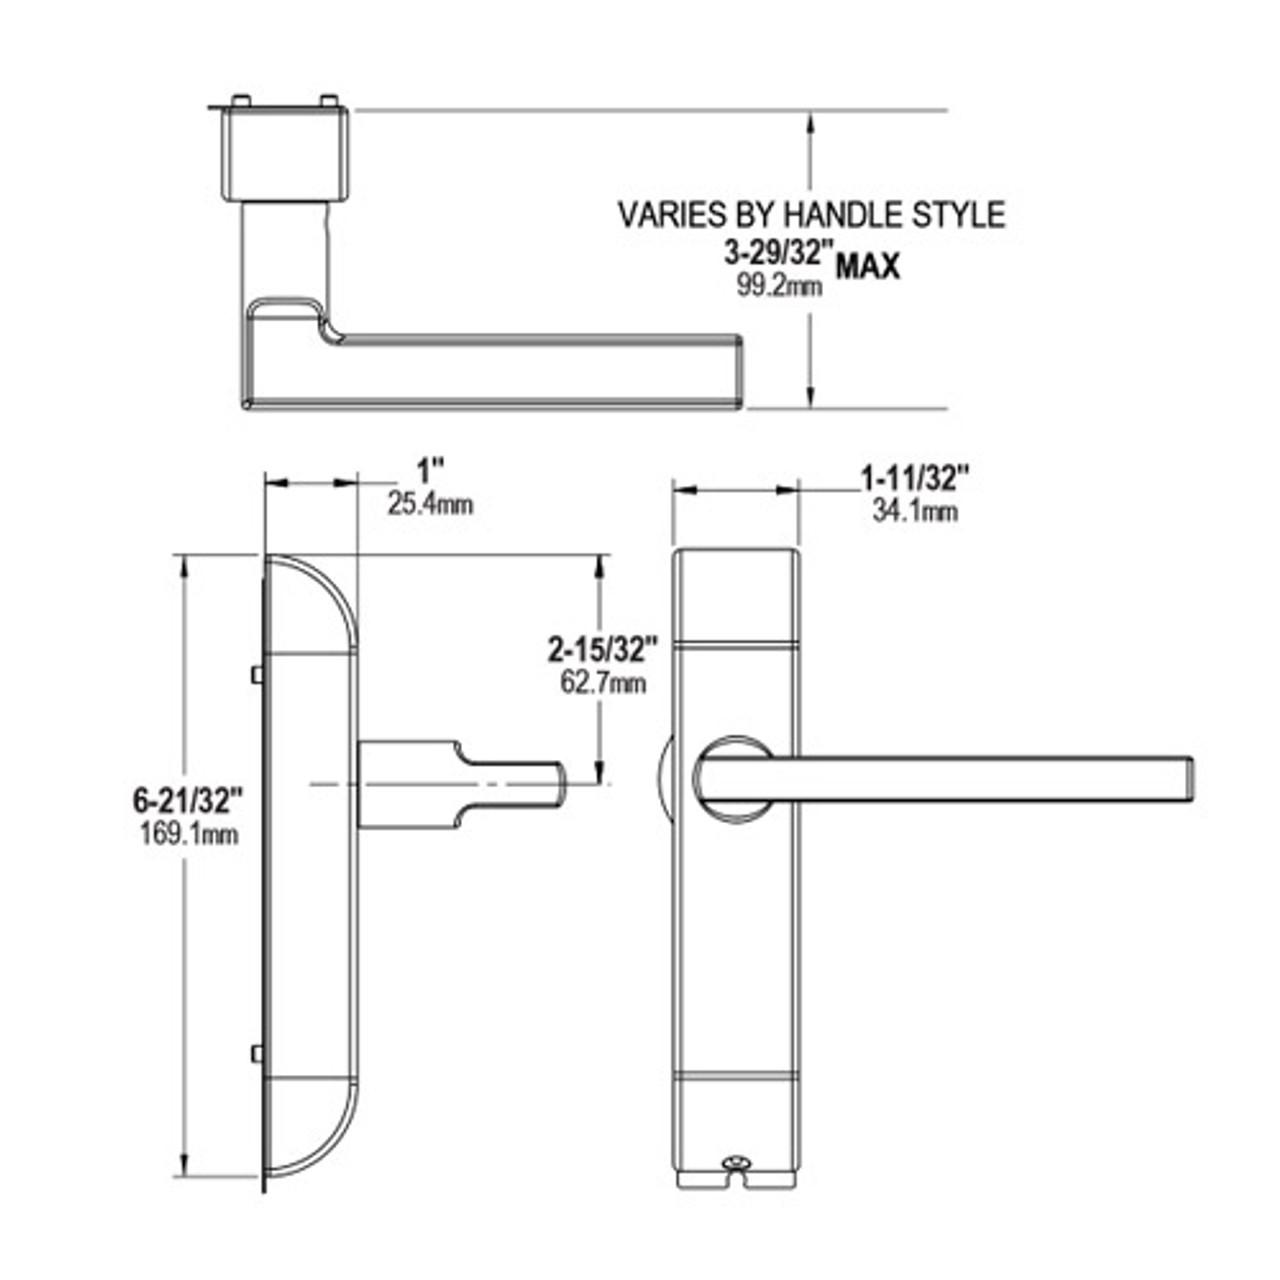 4600M-MV-621-US10B Adams Rite MV Designer handle Dimensional View